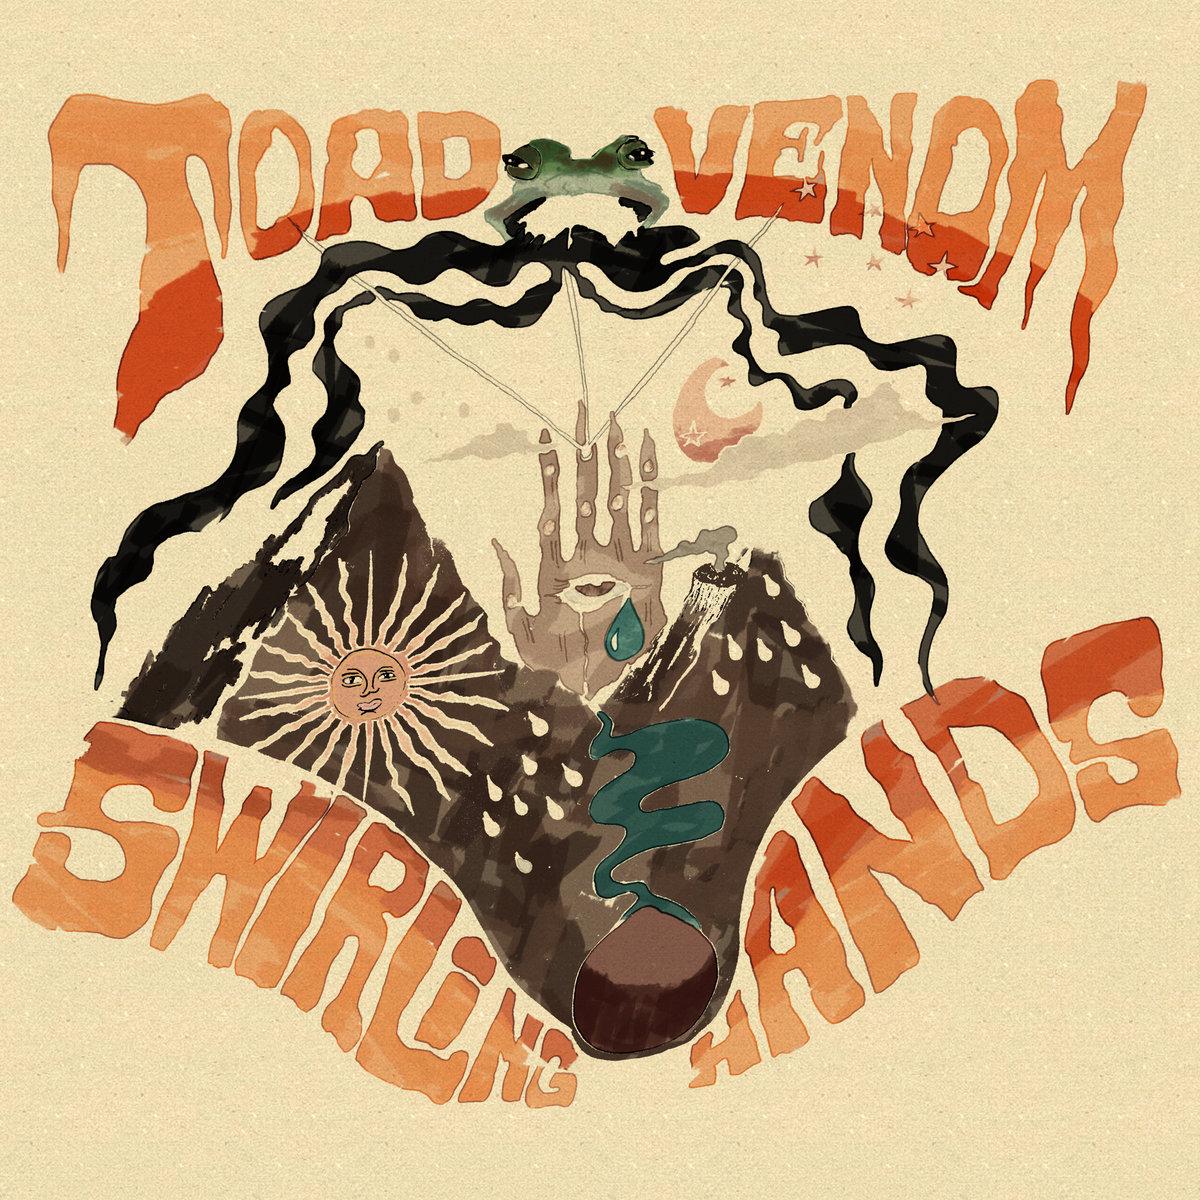 toad venom swirling hands